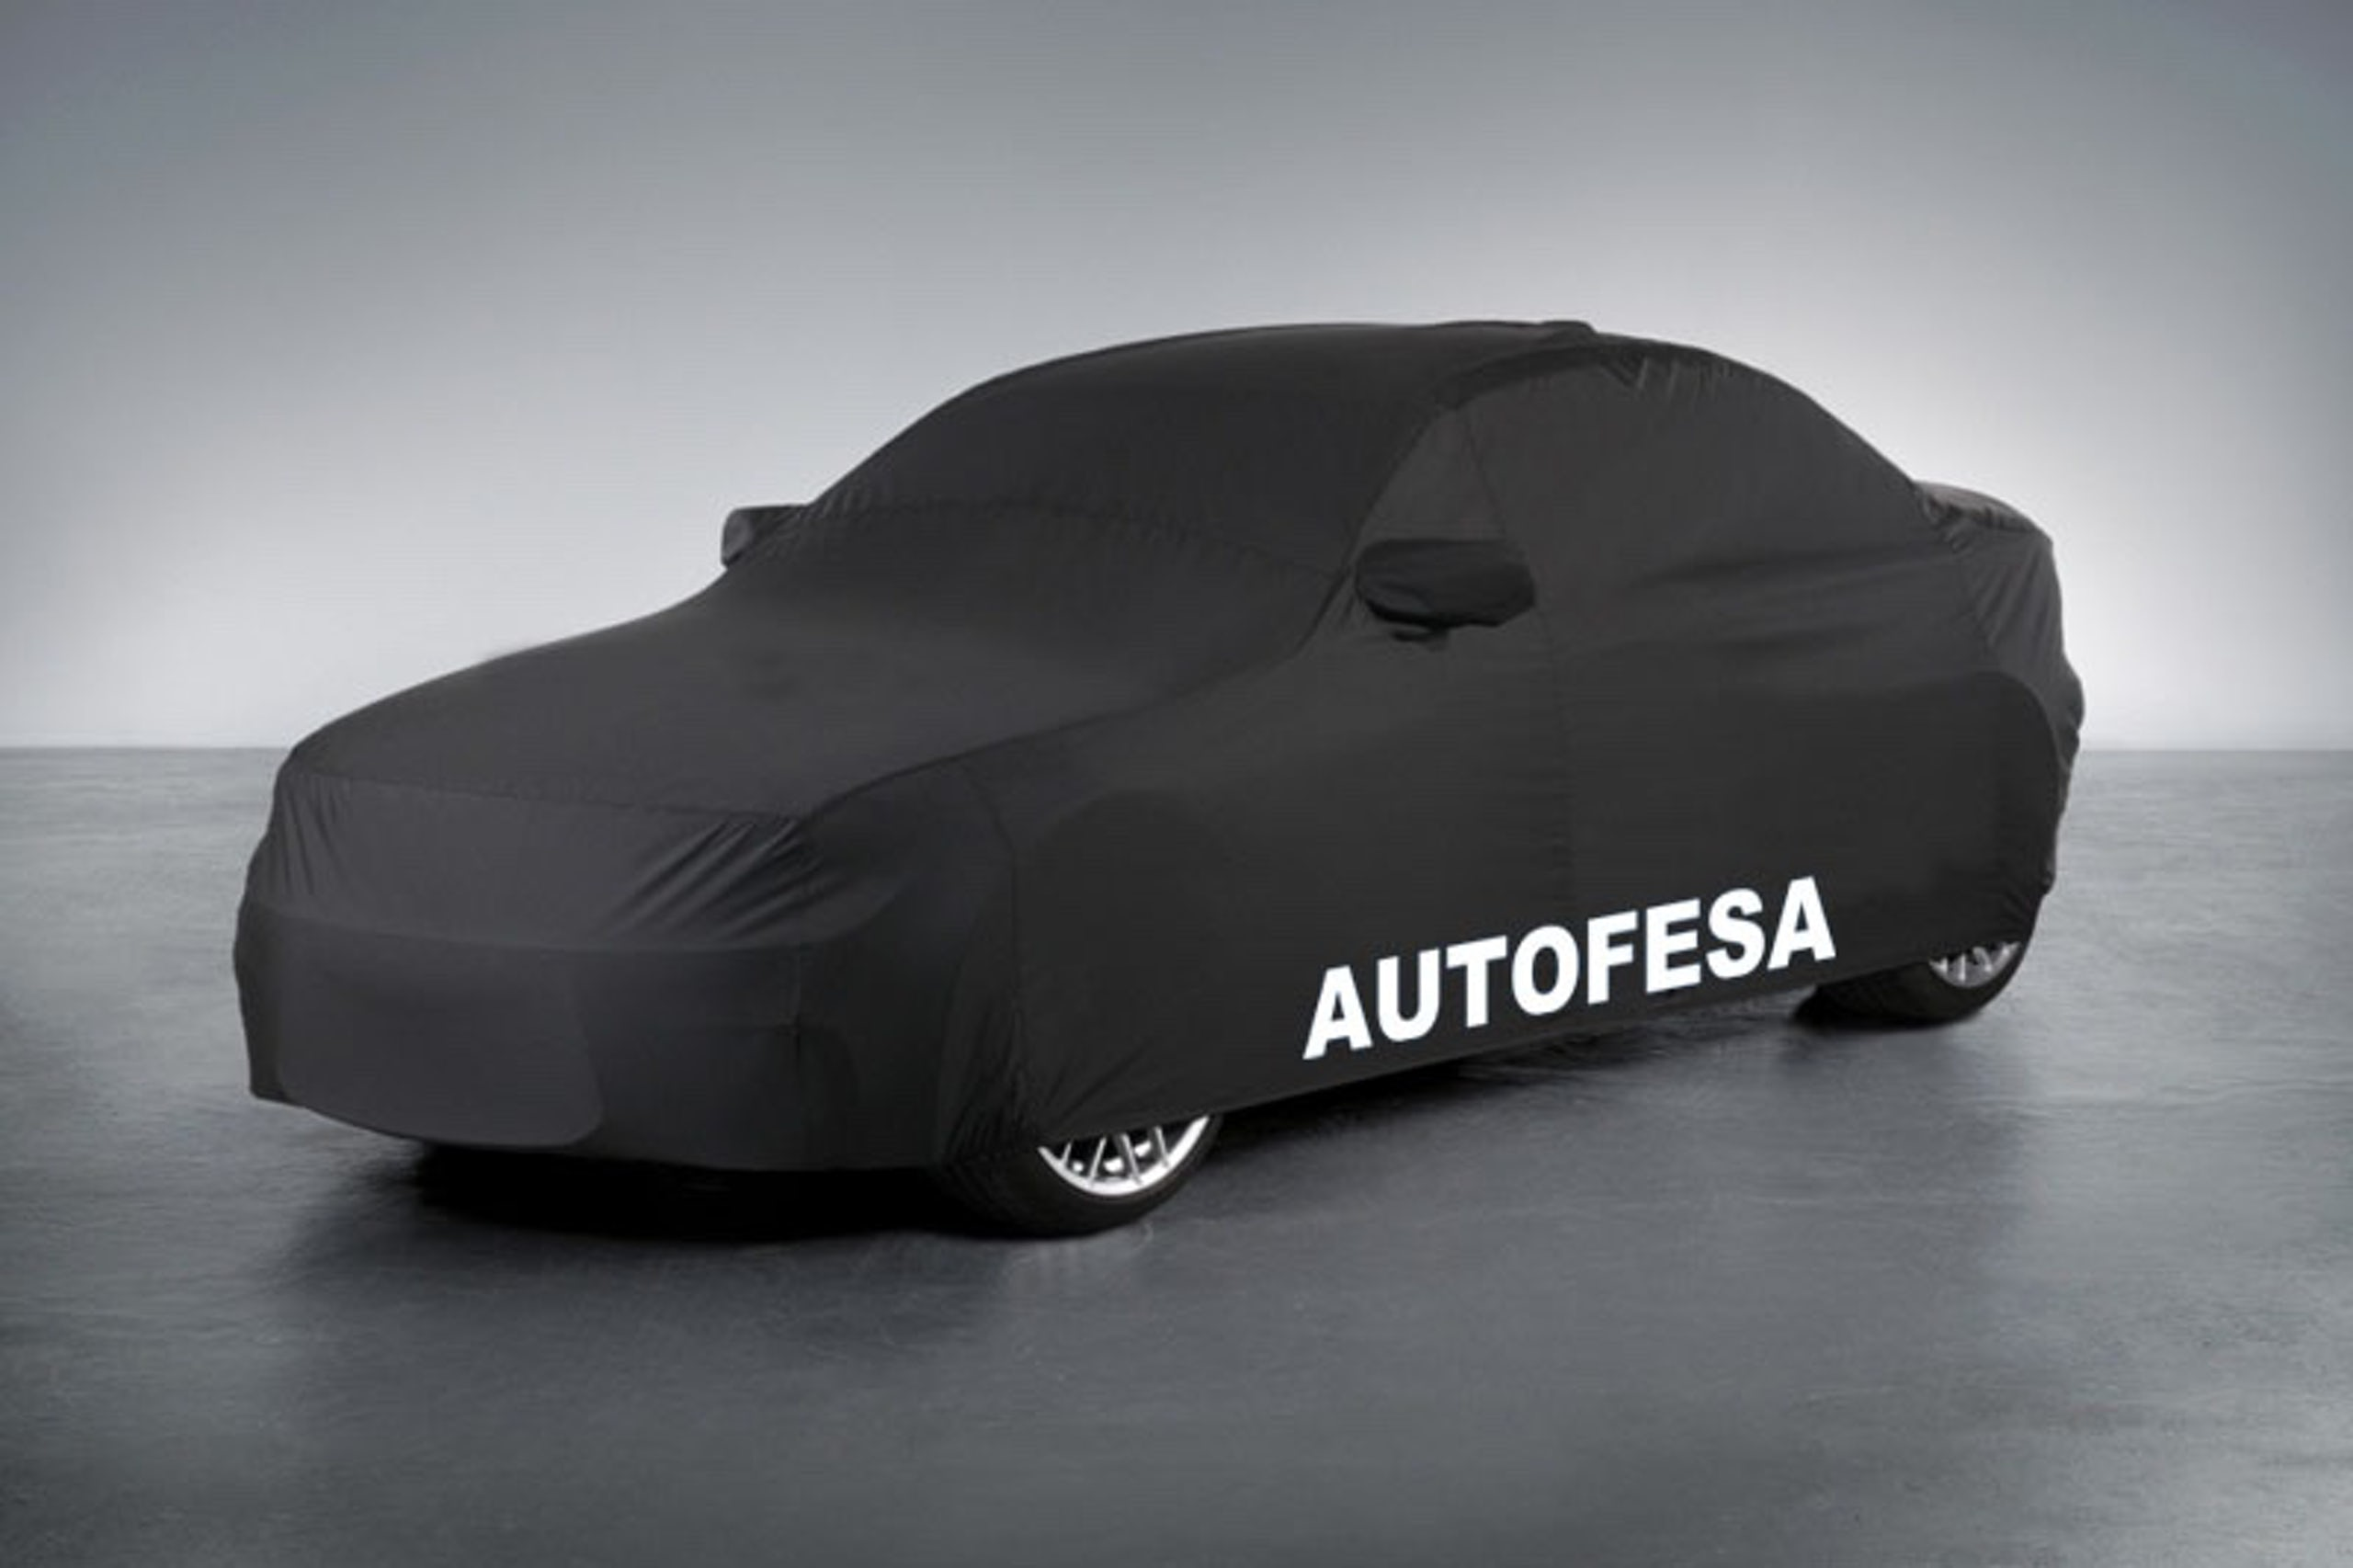 Mitsubishi Outlander 2.0 DI-D 150cv Motion 2WD 5p 7plz Auto S/S - Foto 11